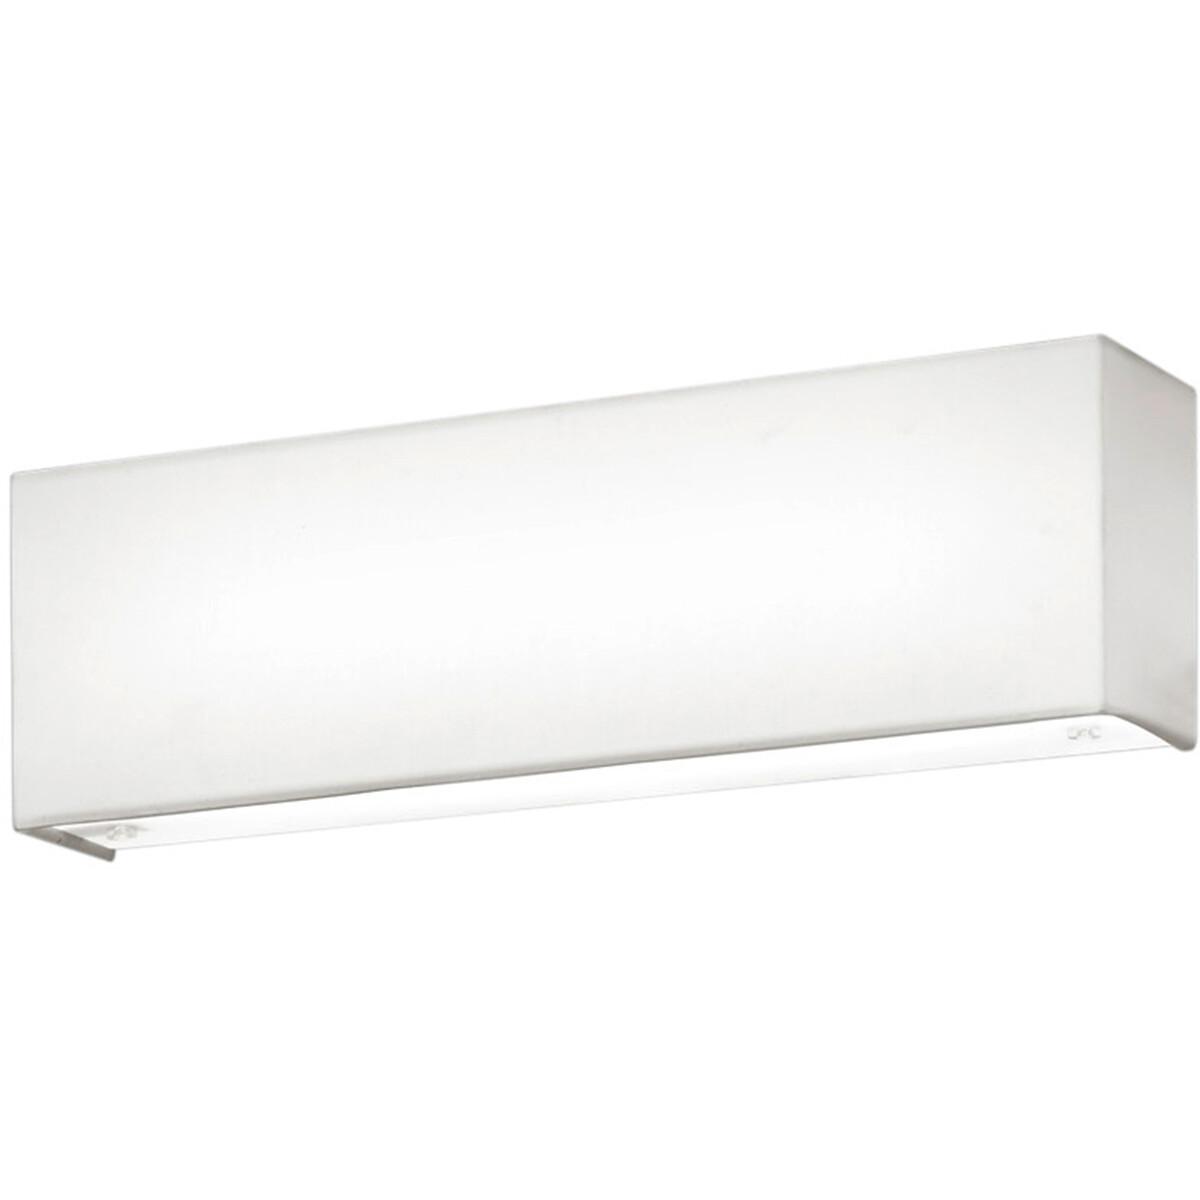 LED Wandlamp - Wandverlichting - Trion Lanago - 6W - Warm Wit 3000K - Rechthoek - Mat Wit - Aluminiu